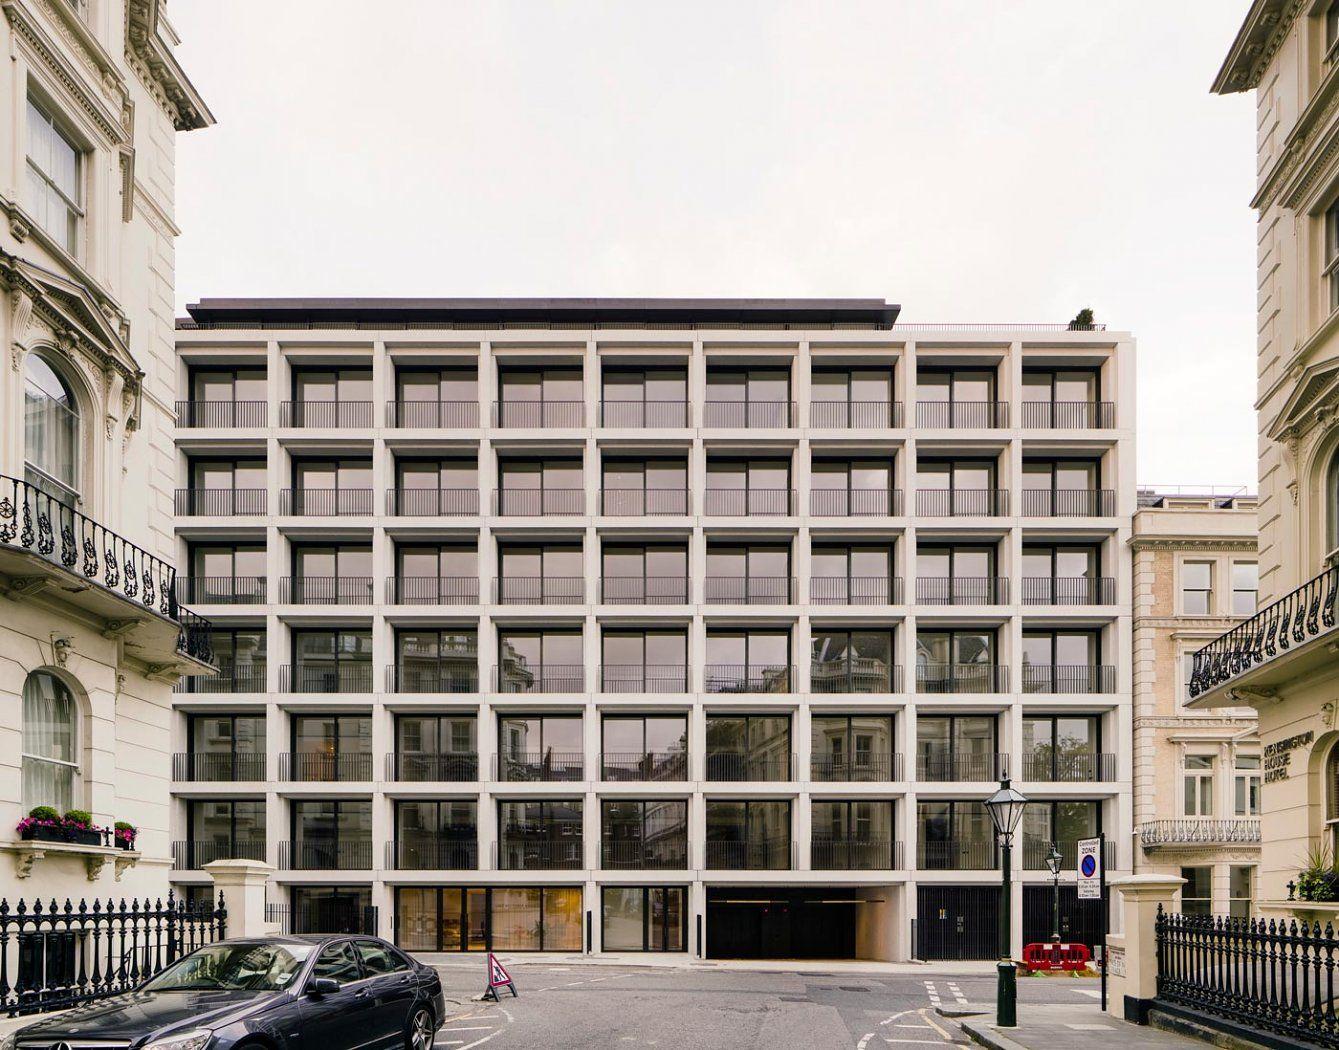 david chipperfield buildings - photo #22